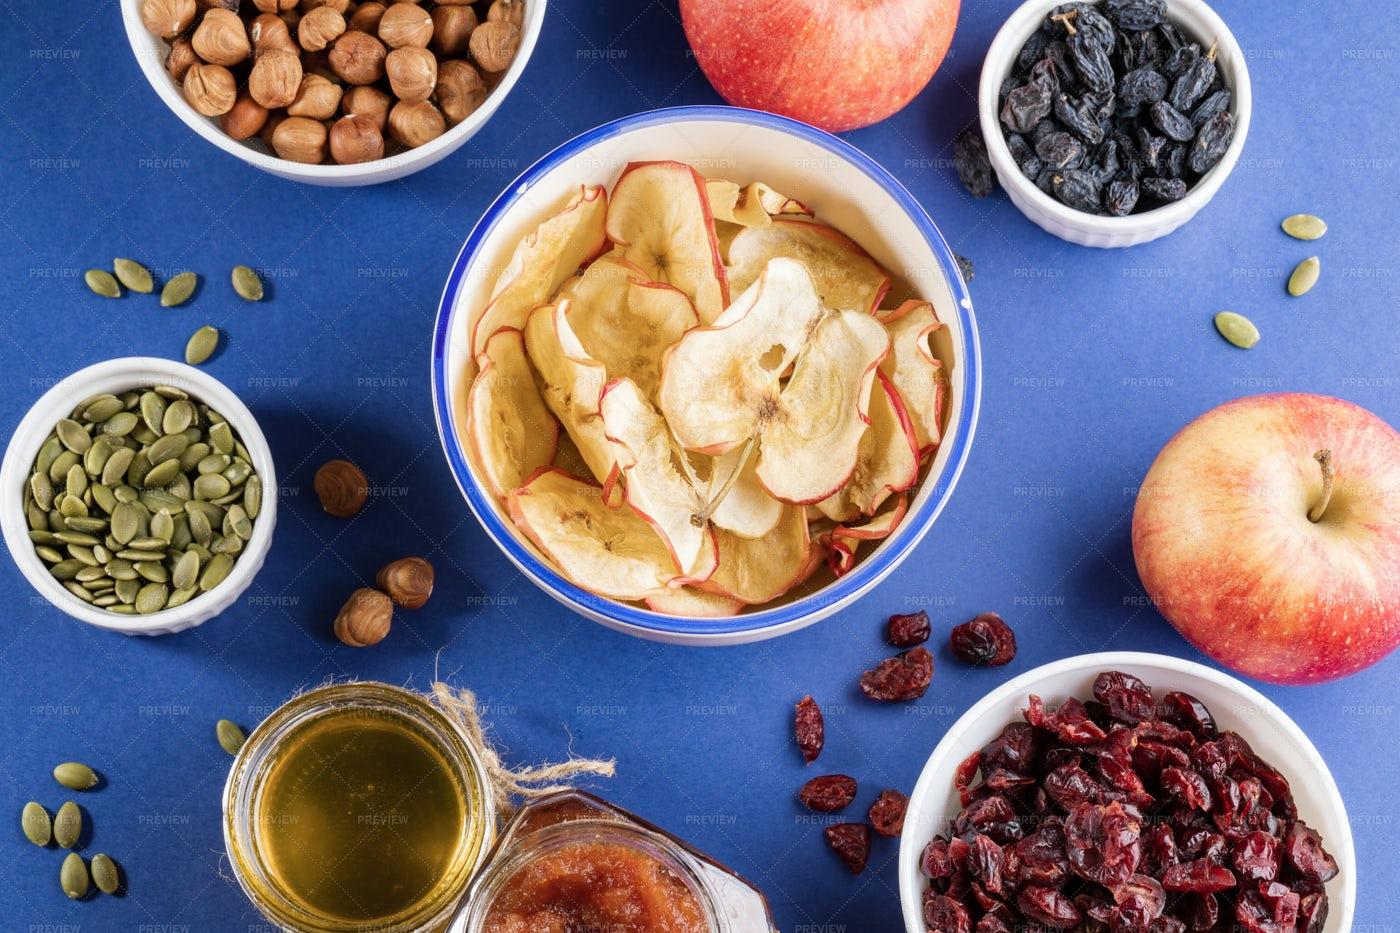 Healthy Snacks: Stock Photos